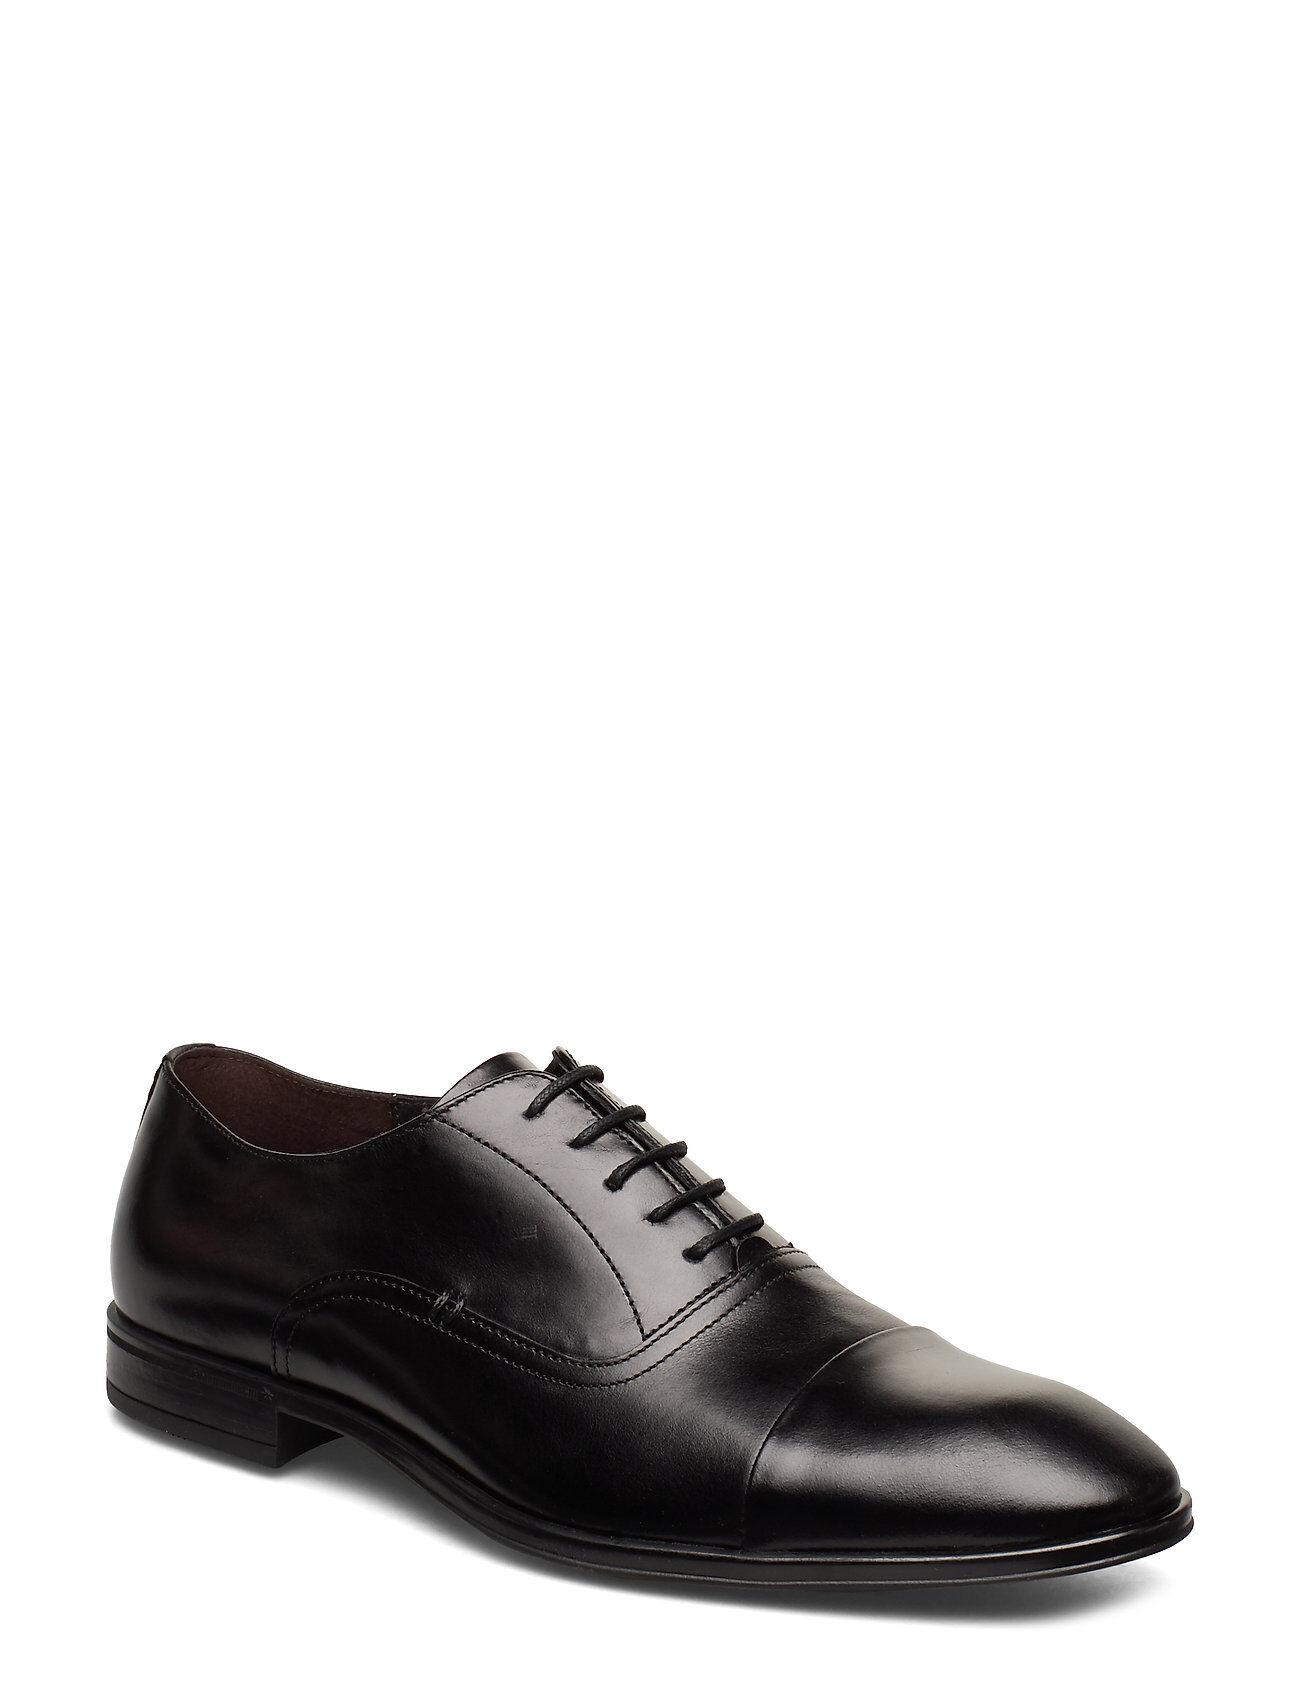 Playboy Footwear 2498 Shoes Business Laced Shoes Musta Playboy Footwear